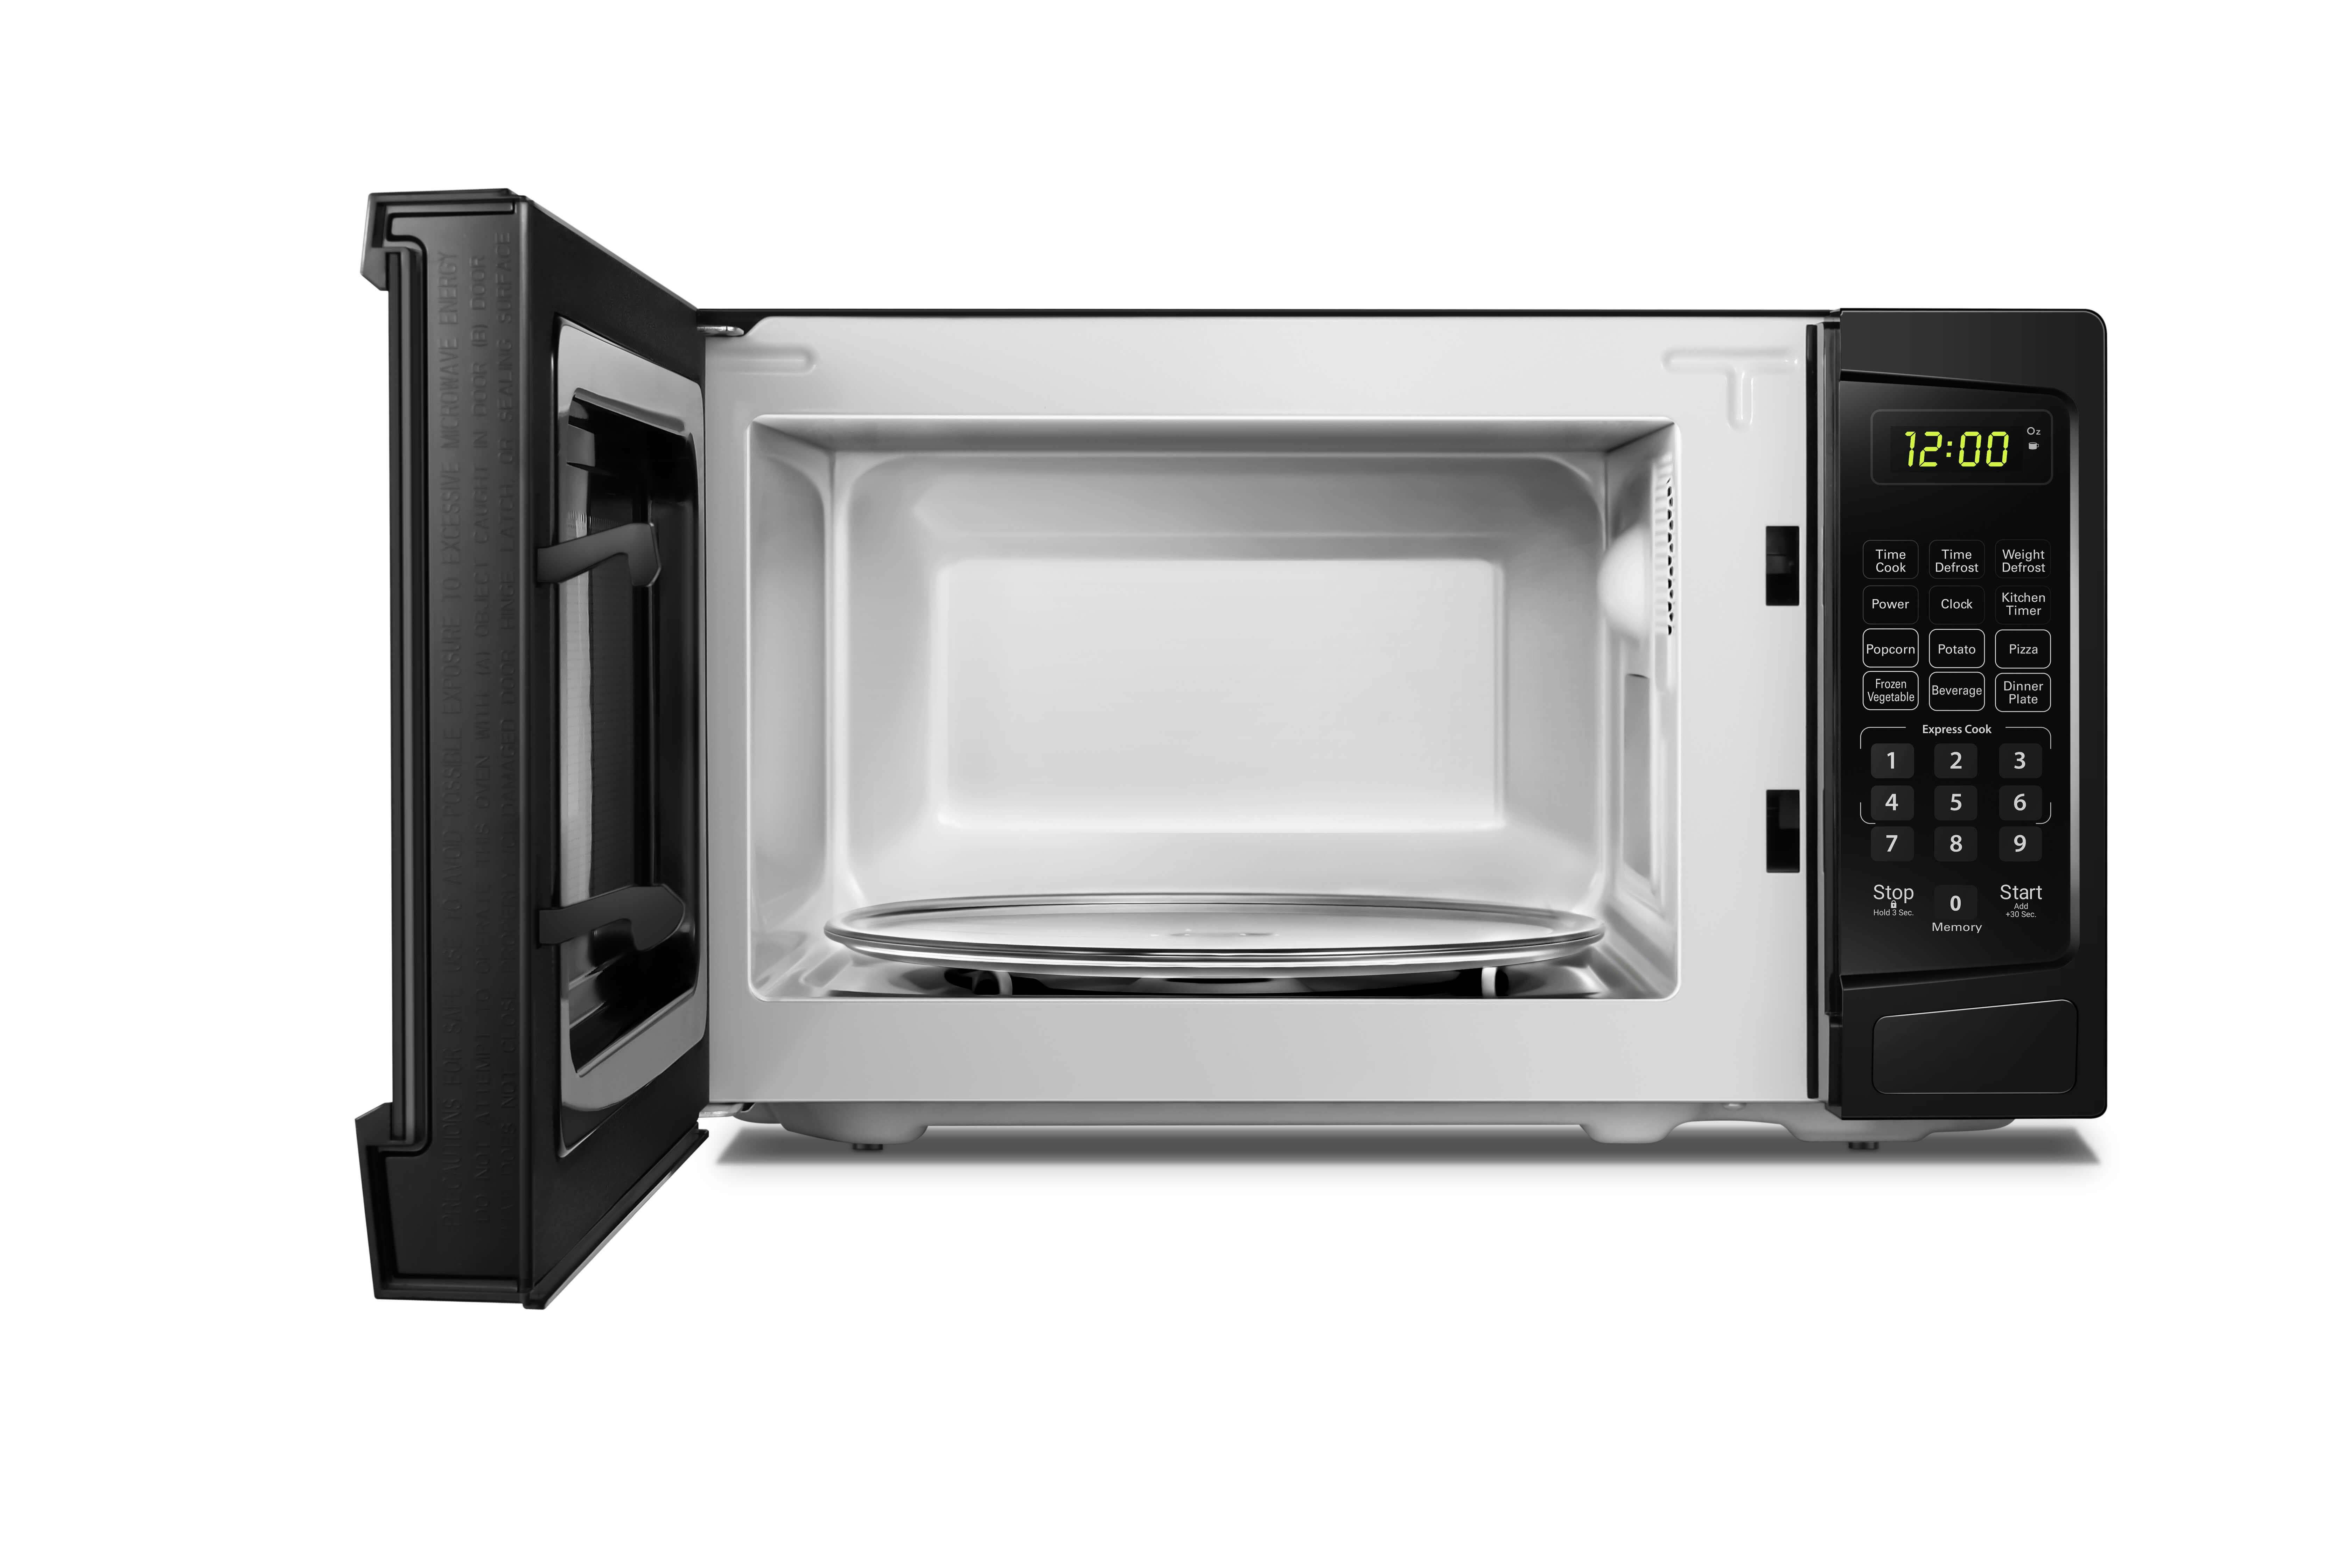 Danby 0.9 cuft Black Microwave